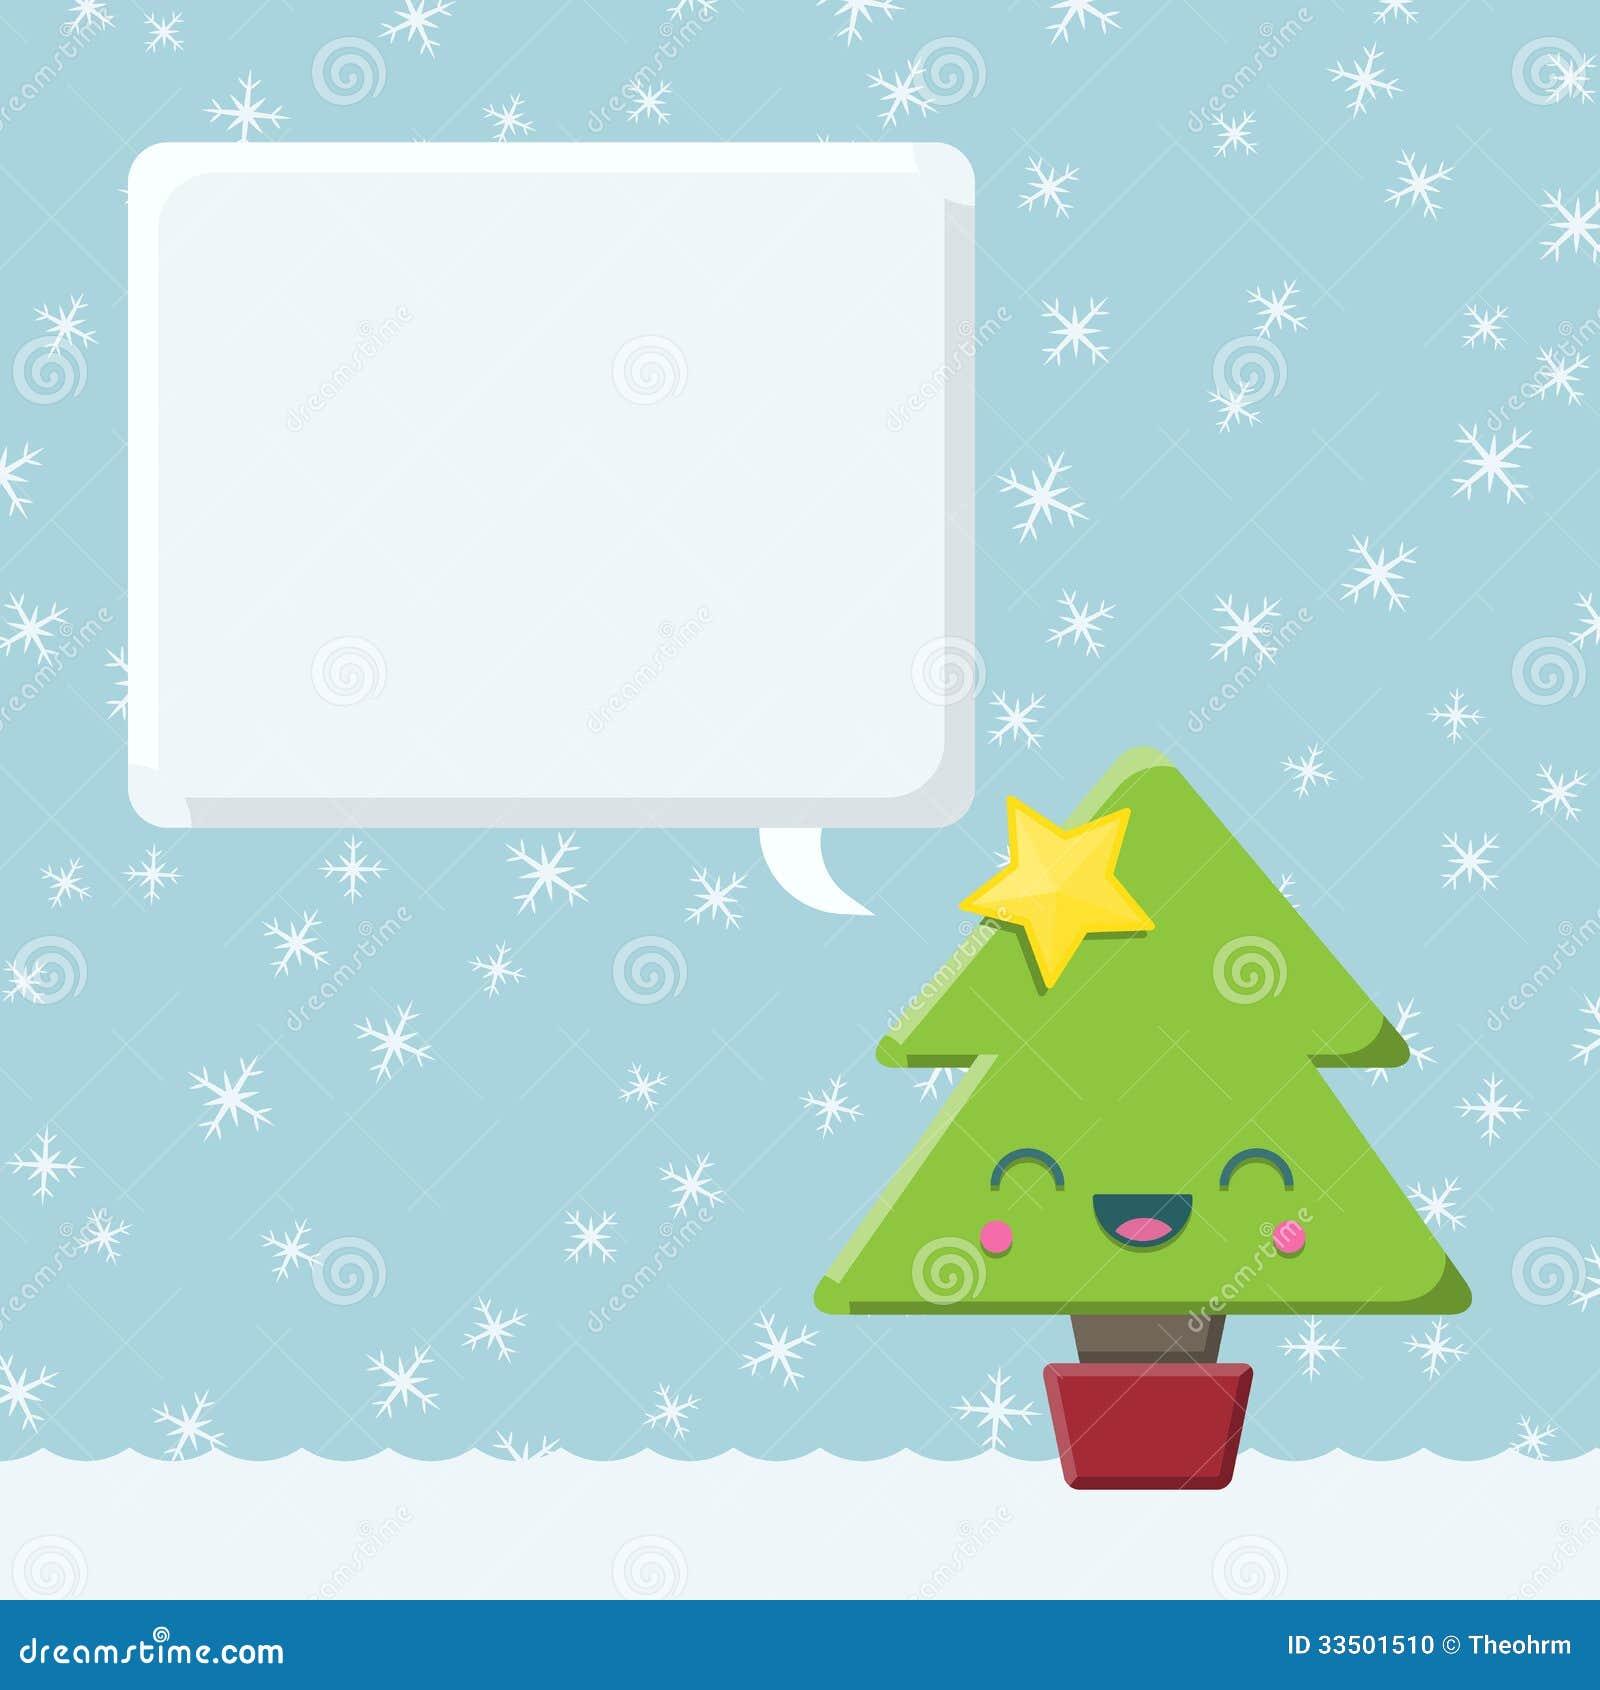 Kawaii Christmas Tree With Speech Bubble Stock Photo - Image: 33501510